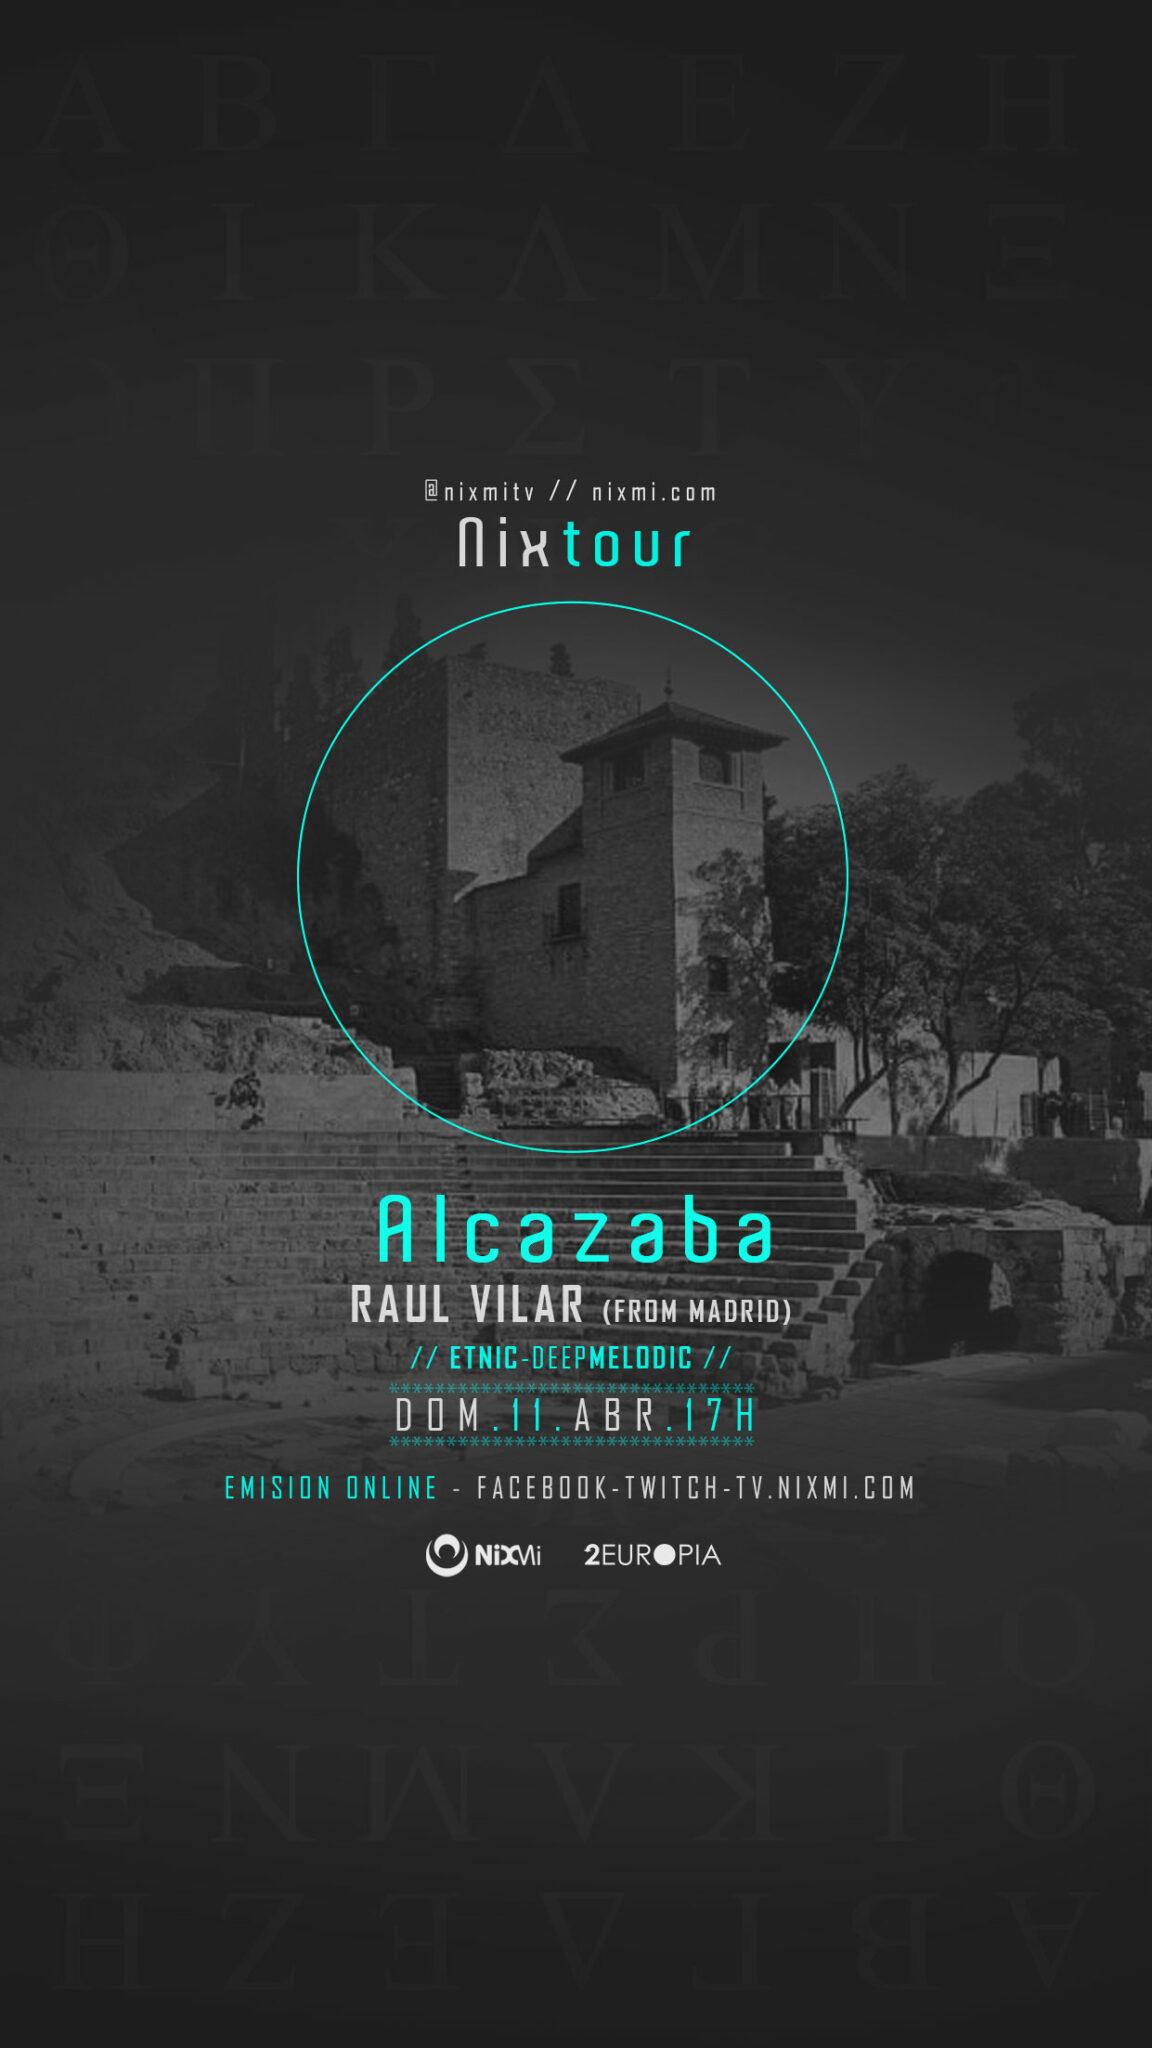 2021-04-11—nixtour-Alcazaba